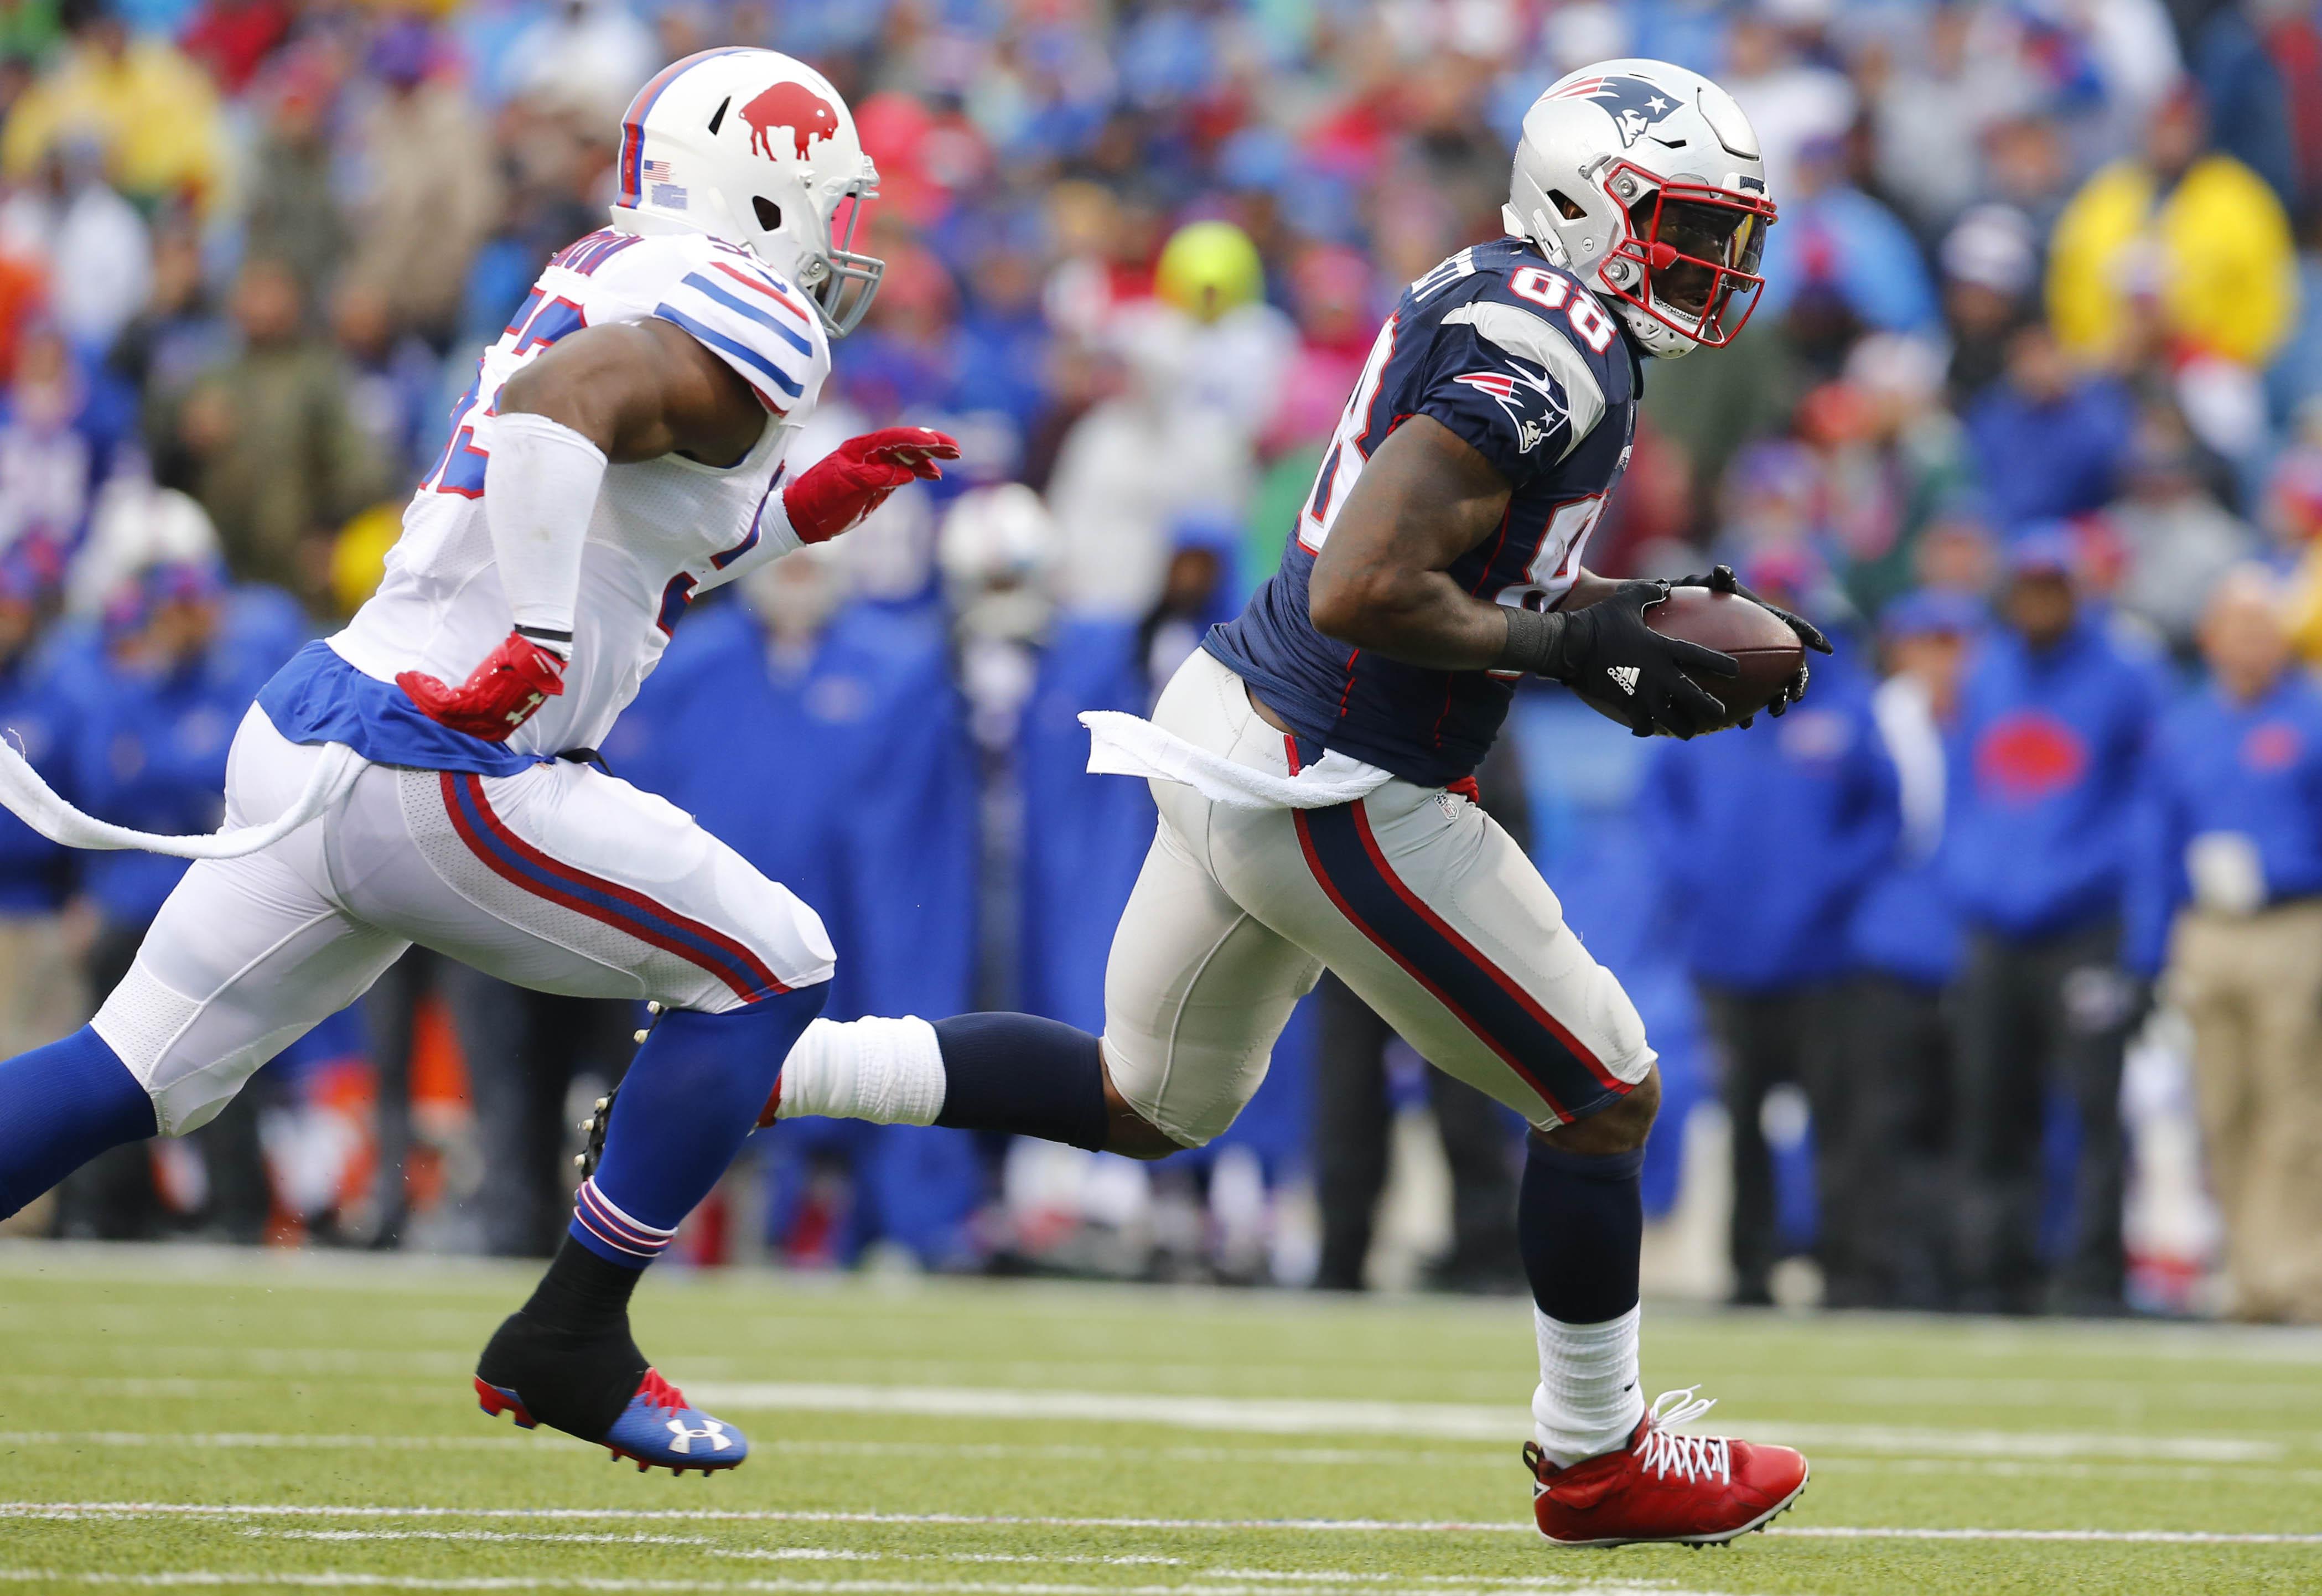 New England Patriots tight end Martellus Bennett (88) runs away from Buffalo Bills linebacker Zach Brown (53) during the third quarter at New Era Field in Orchard Park Sunday, Oct. 30, 2016.   (Mark Mulville/Buffalo News)